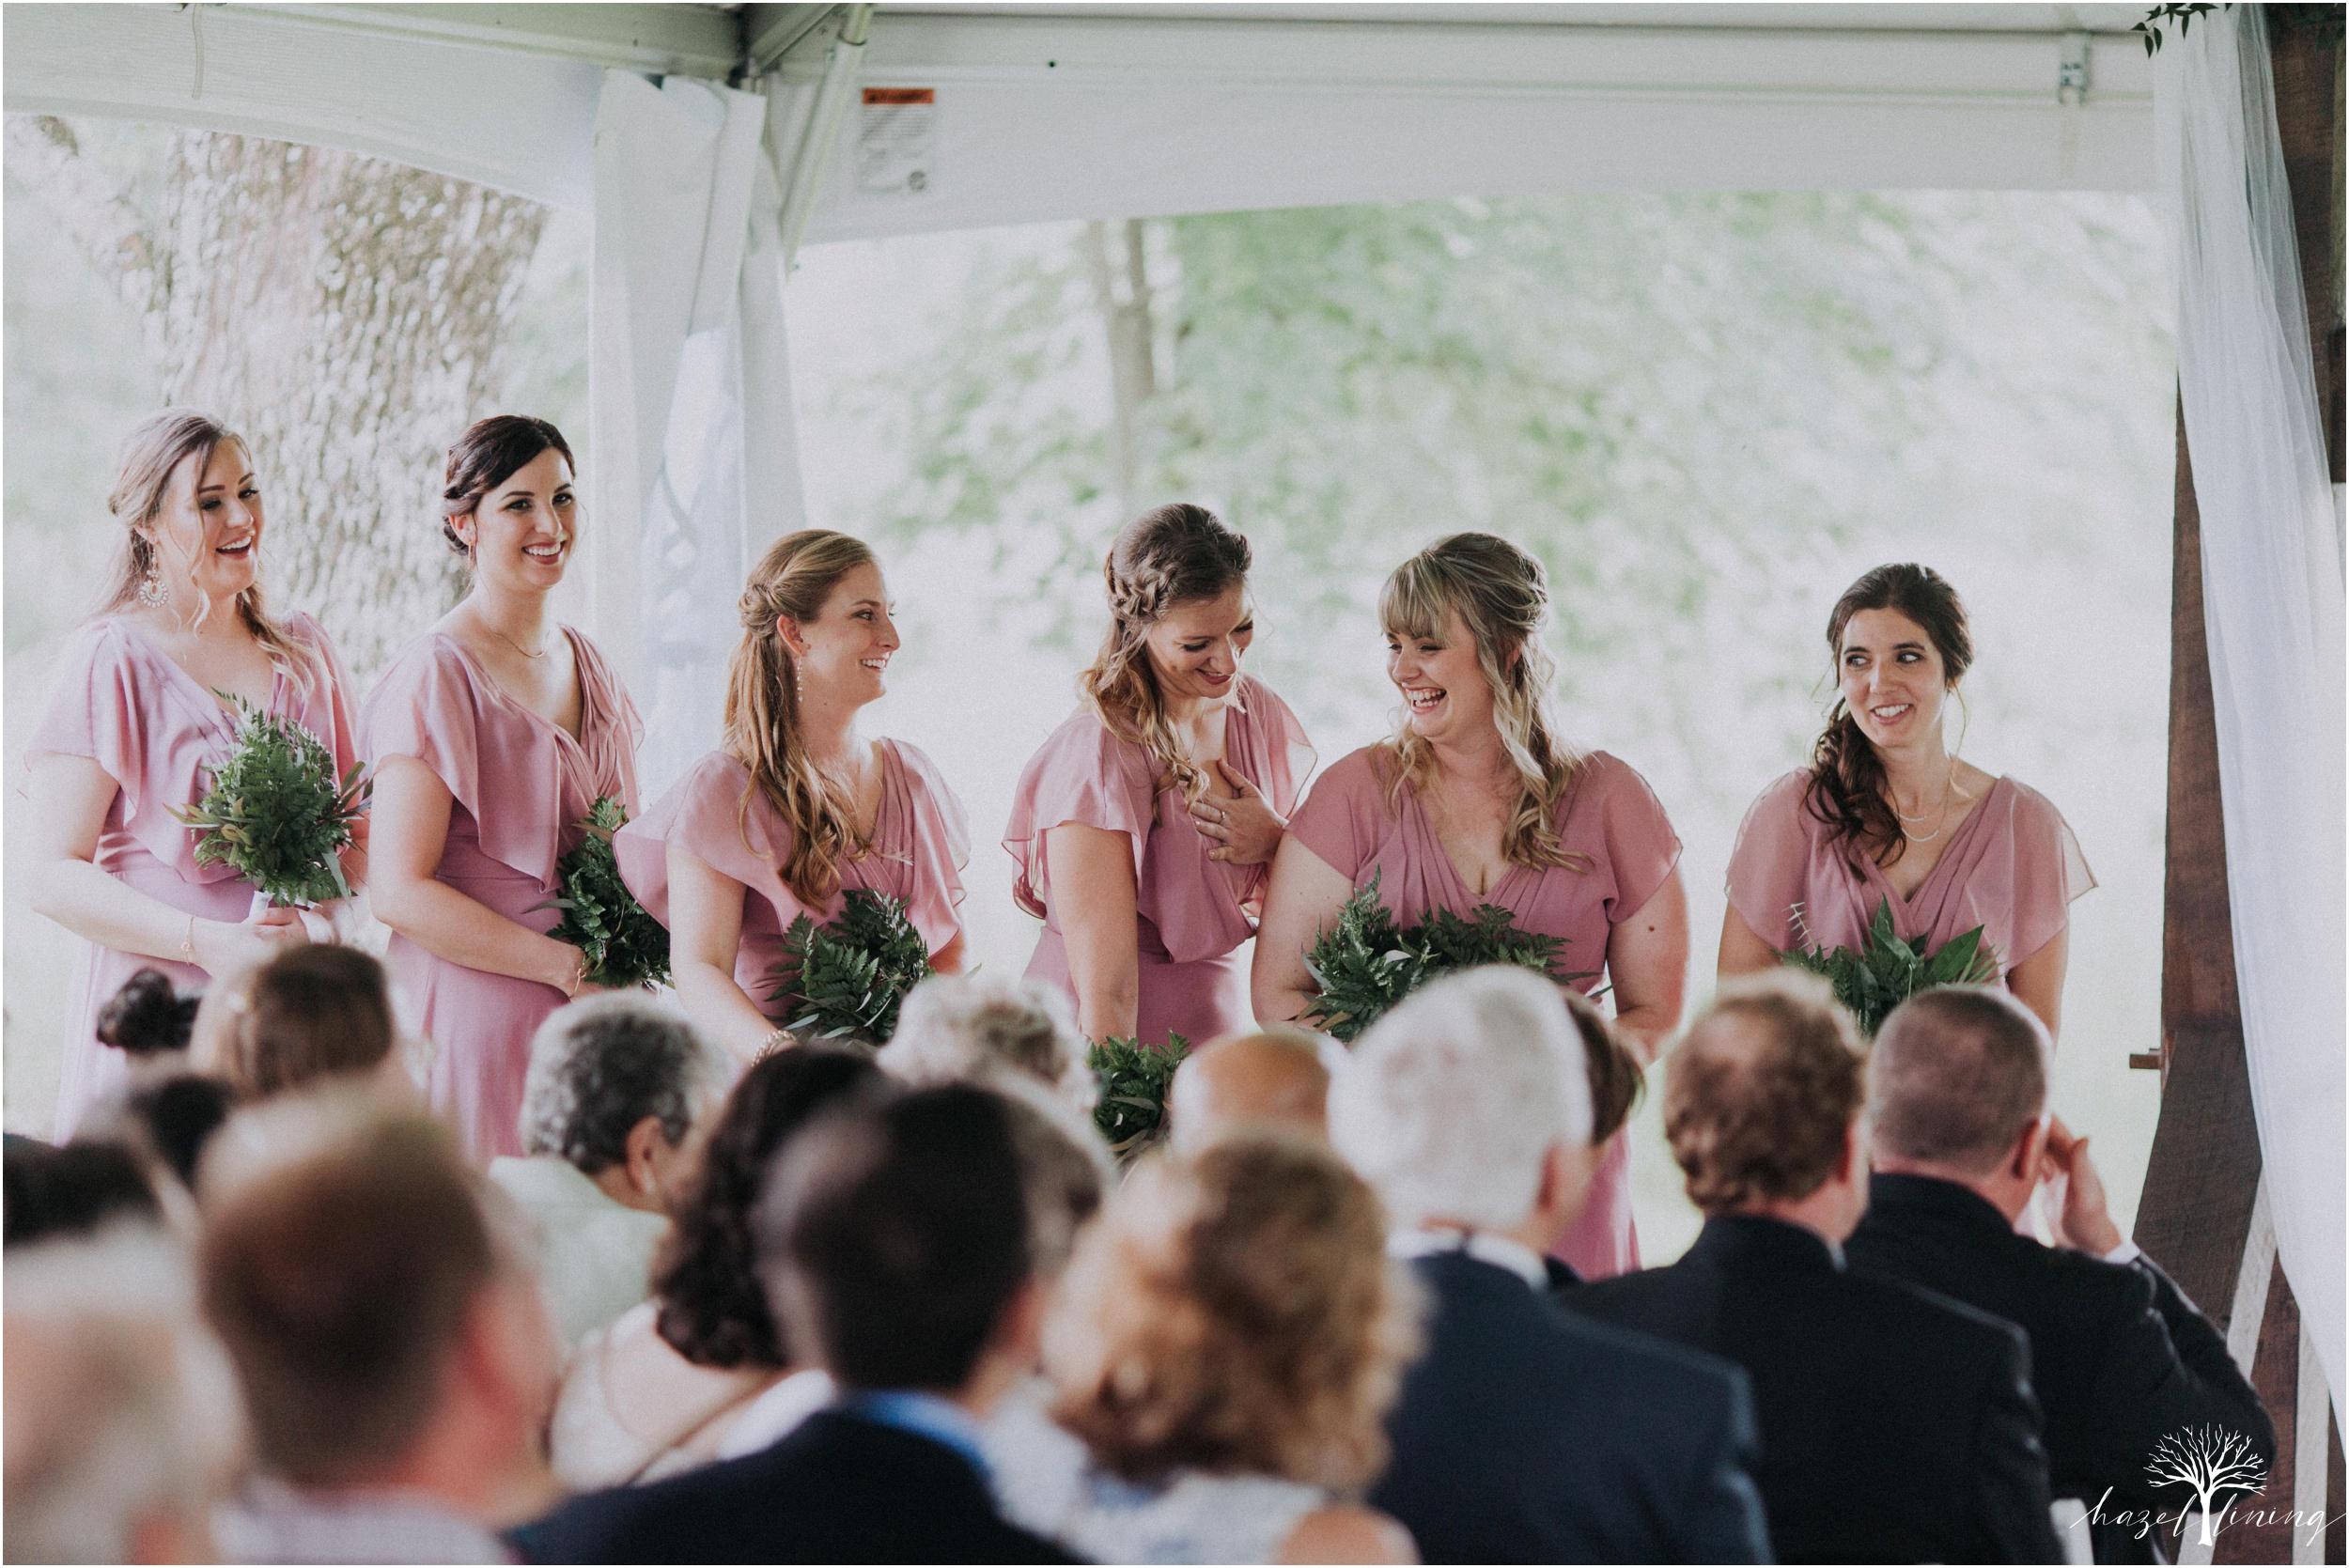 hazel-lining-travel-wedding-elopement-photography-lisa-landon-shoemaker-the-farm-bakery-and-events-bucks-county-quakertown-pennsylvania-summer-country-outdoor-farm-wedding_0060.jpg